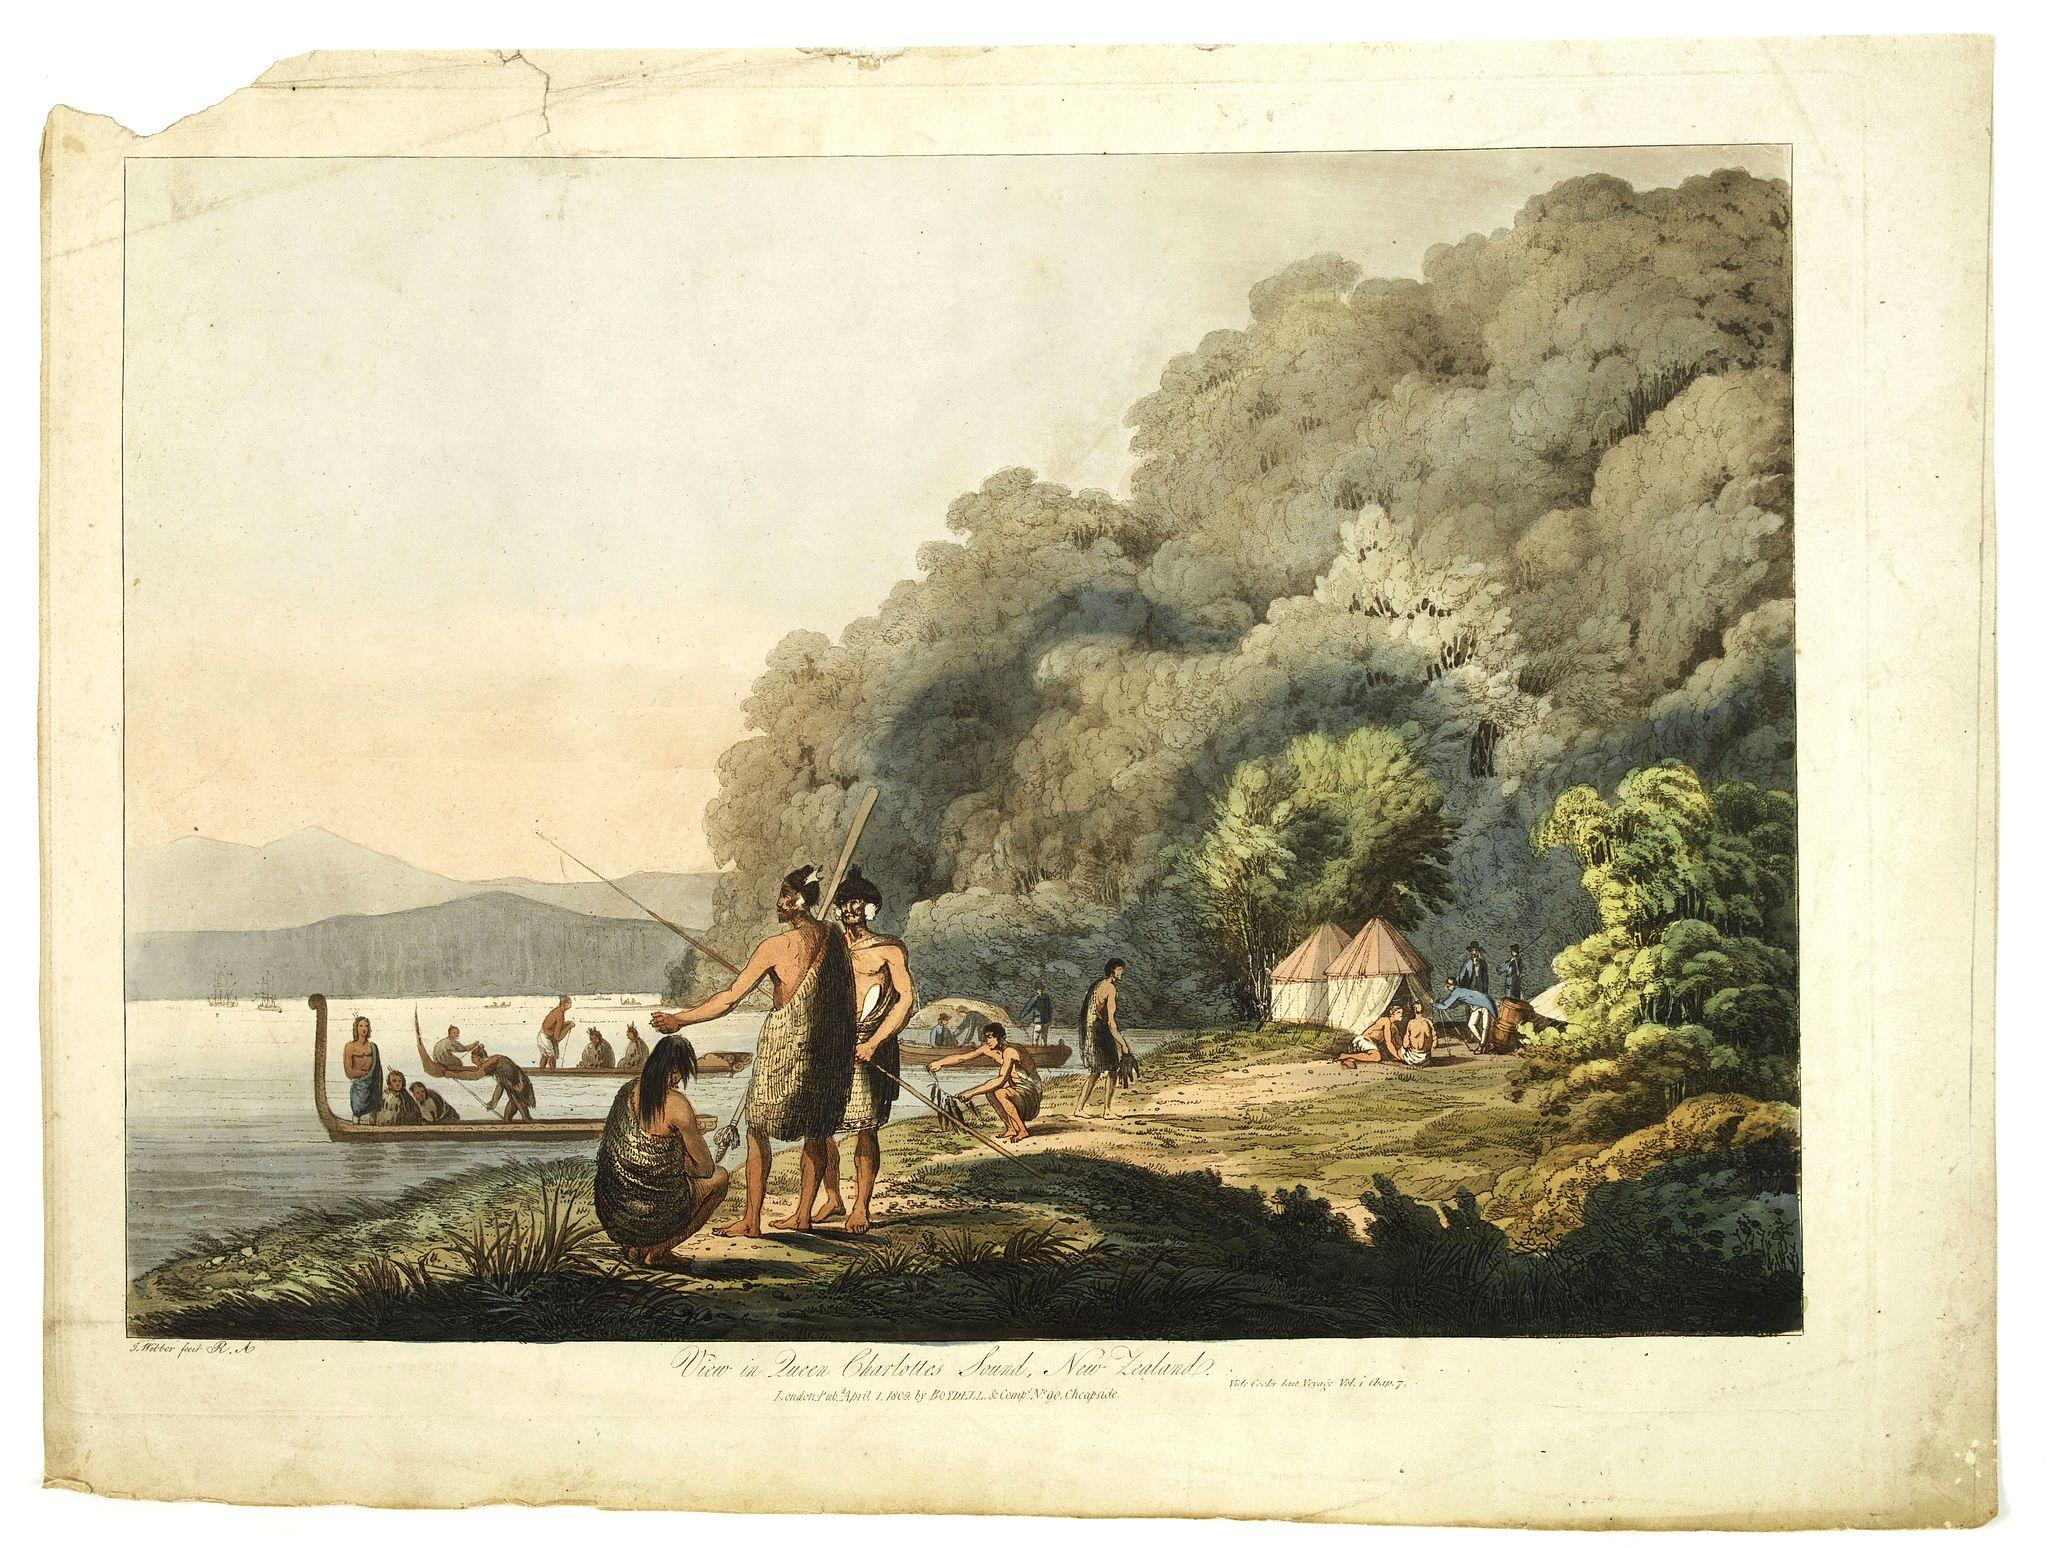 WEBBER, J. -  View in Queen charlotte's sound, New Zealand.